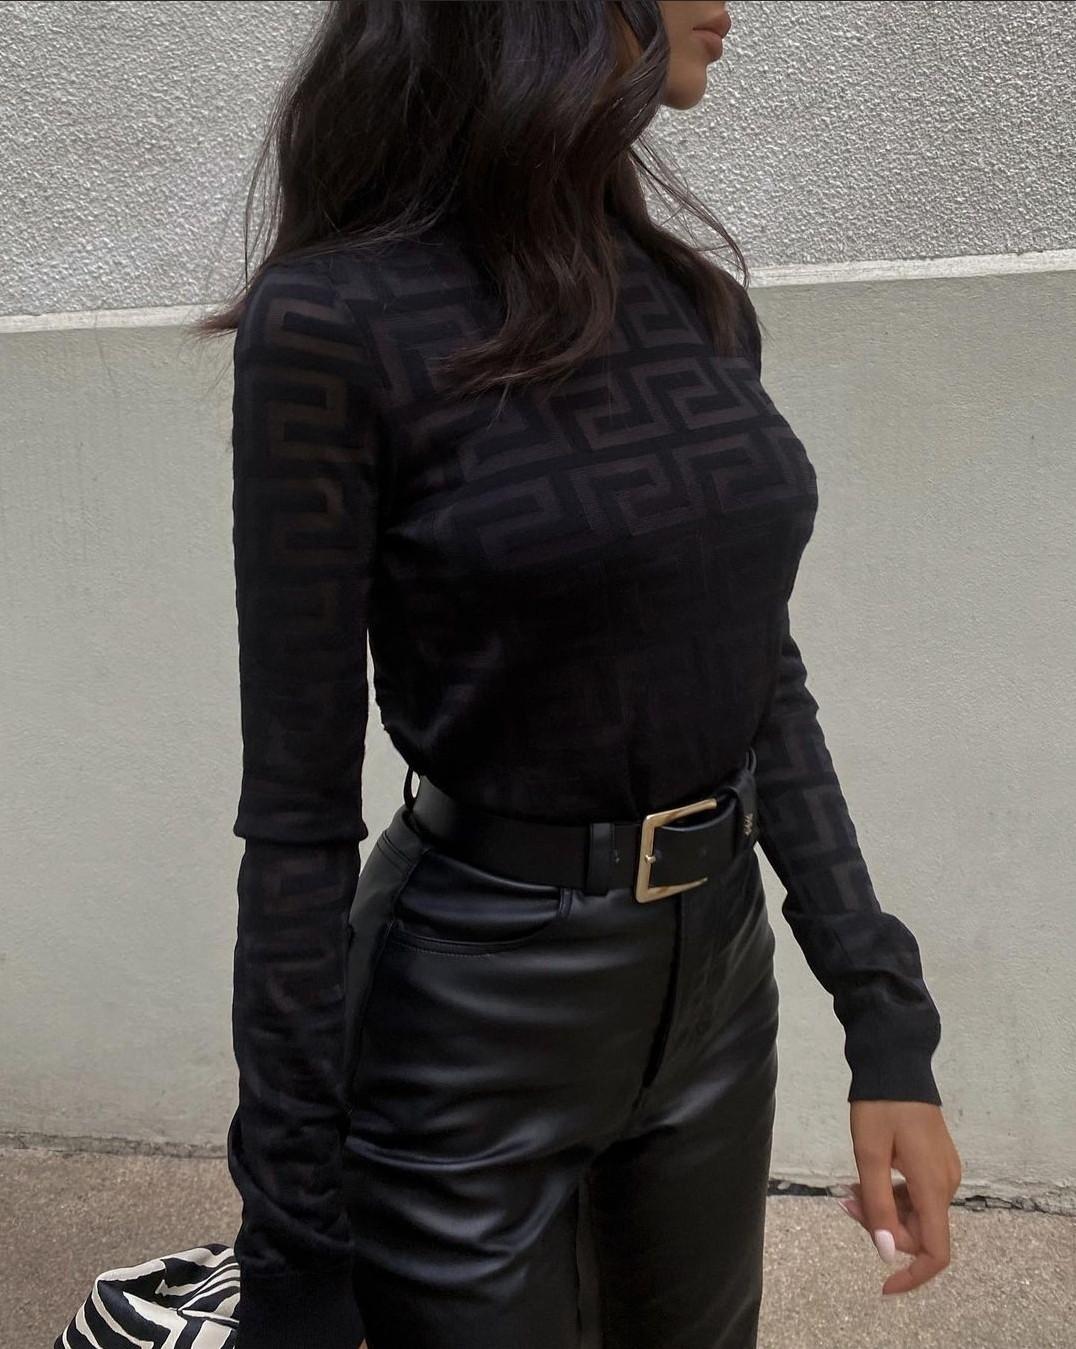 blogger, fashion, and bottegaveneta pouch image